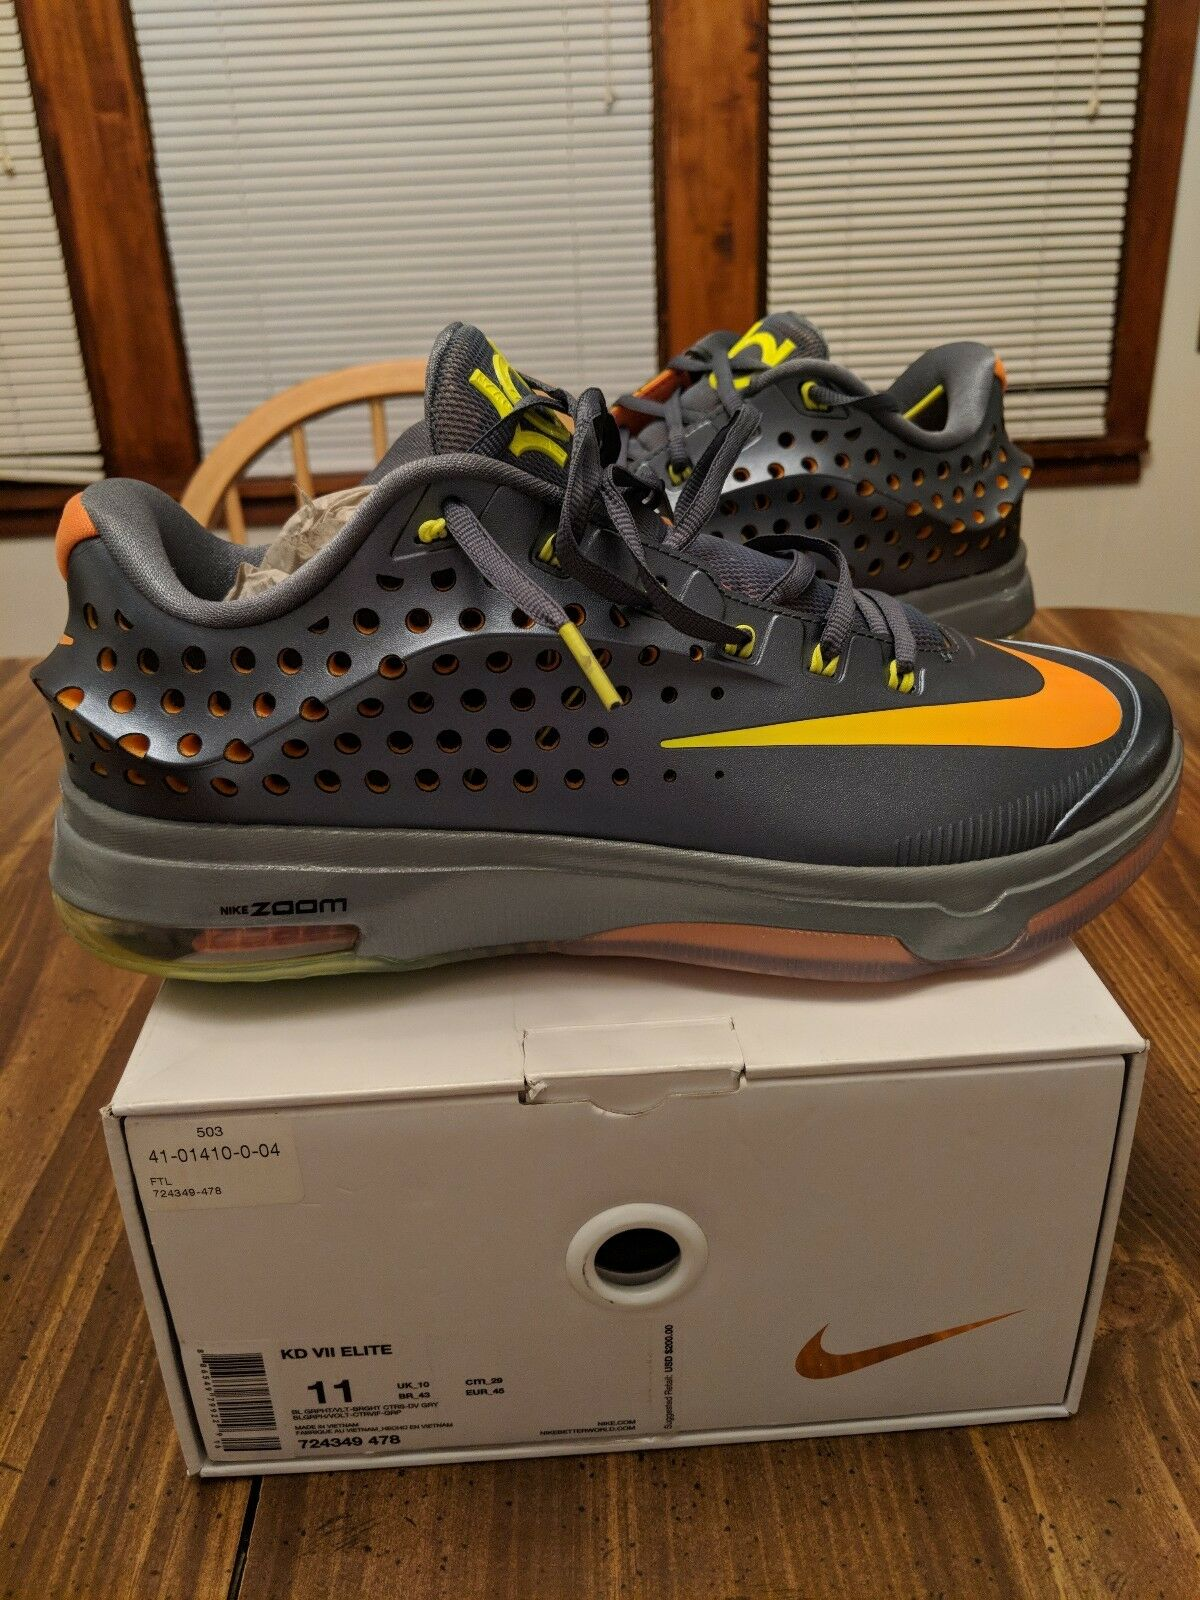 Nike scarpe kd vii 7 elite maschile di basket scarpe Nike taglia 11 cf3981